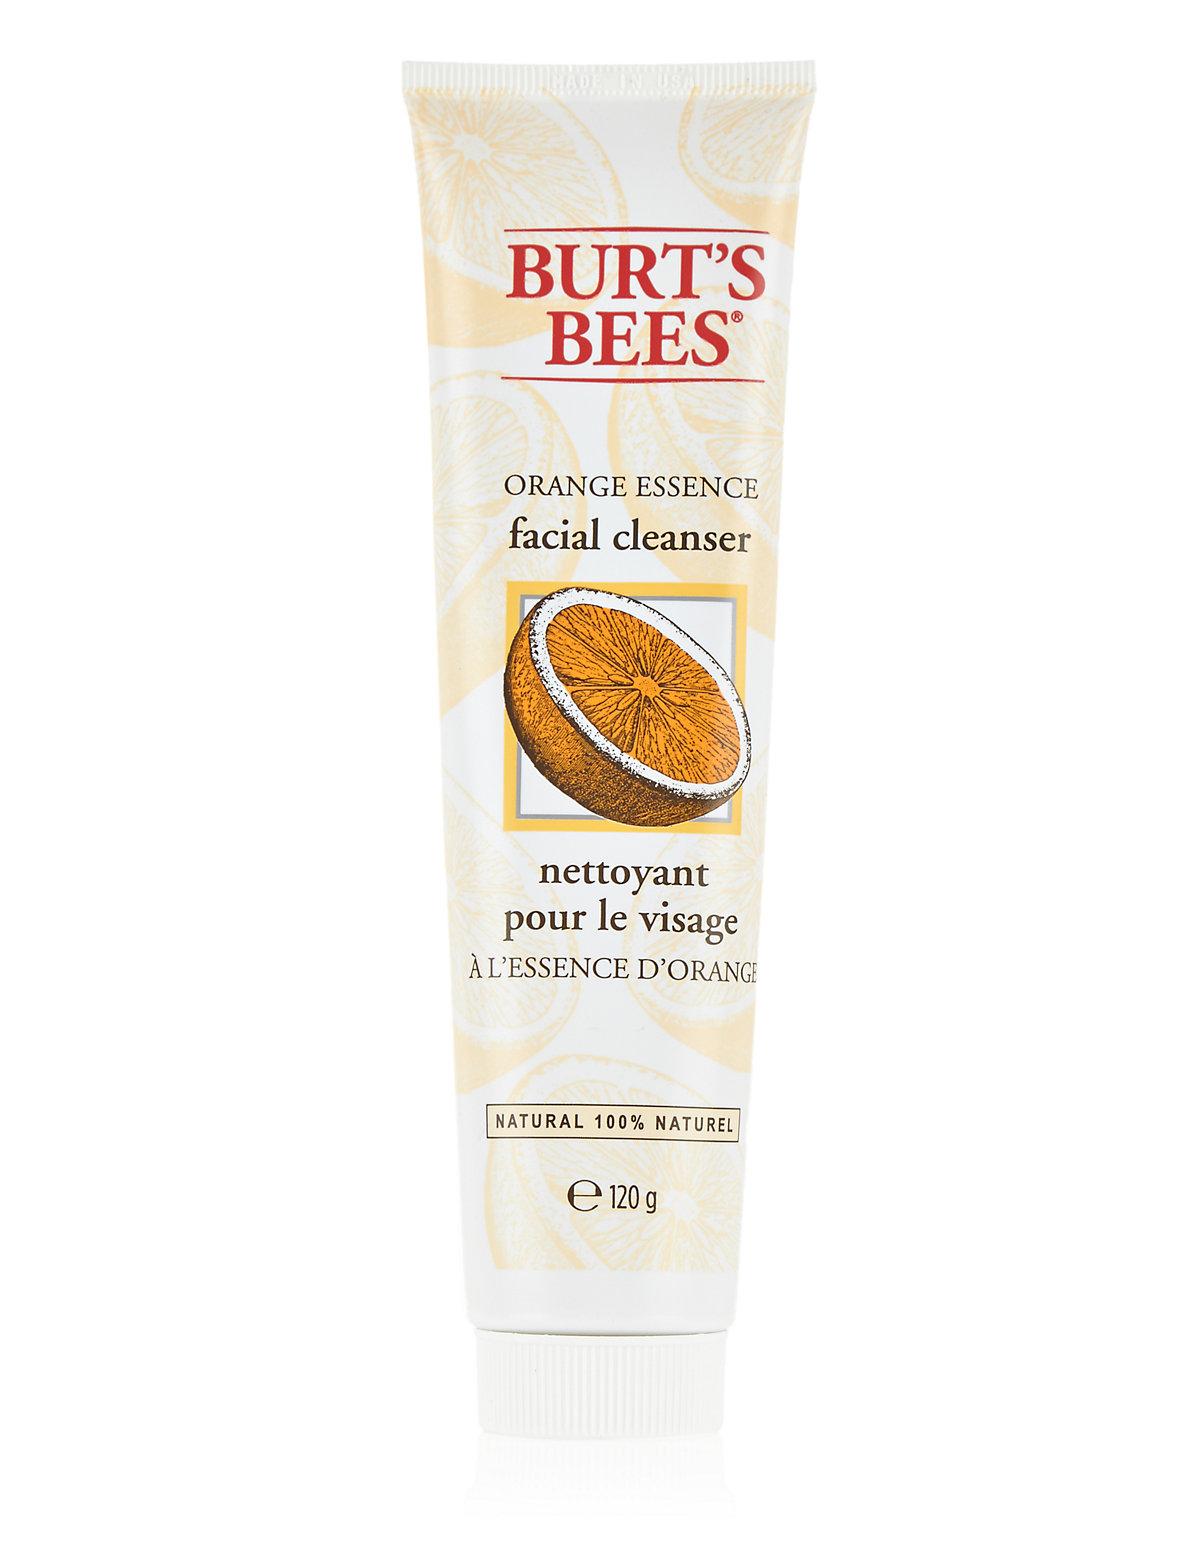 Herbal hibiscus tea 55g dr bean australia - Burt S Bees Orange Essence Facial Cleanser 120g